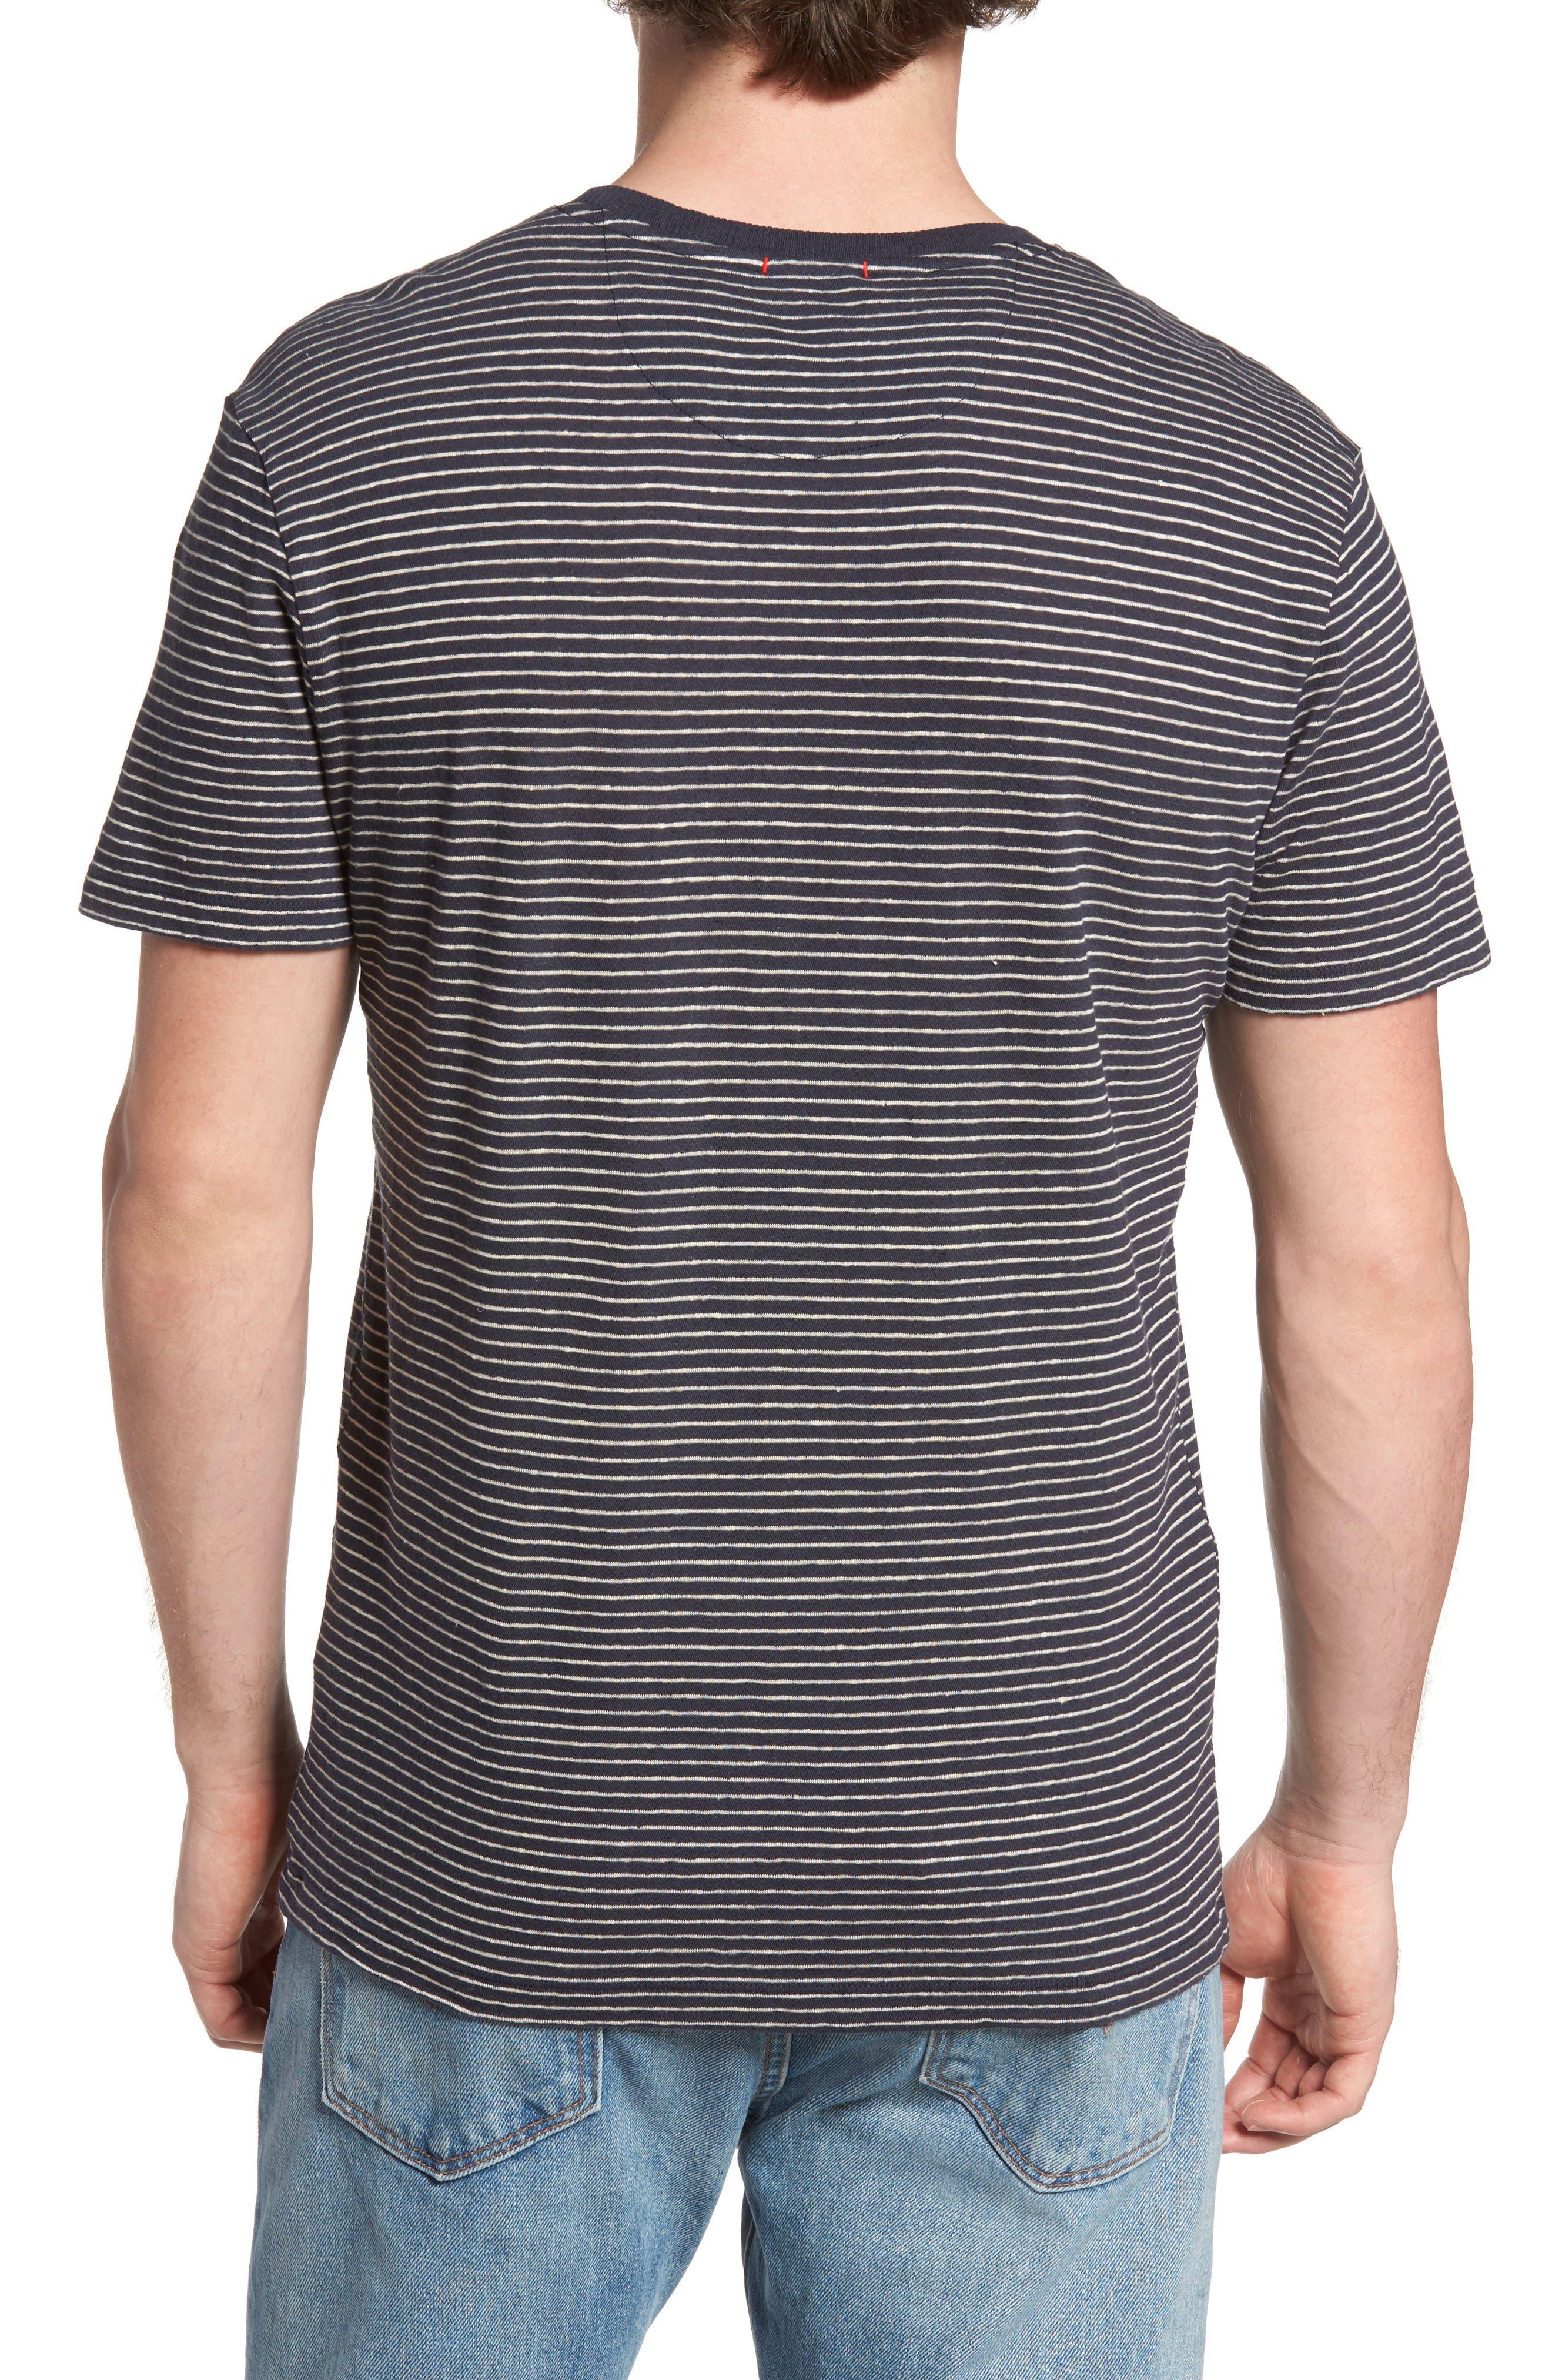 John Rich Stripe Cotton & Linen T-Shirt,                             Alternate thumbnail 2, color,                             Dark Navy Stripe B